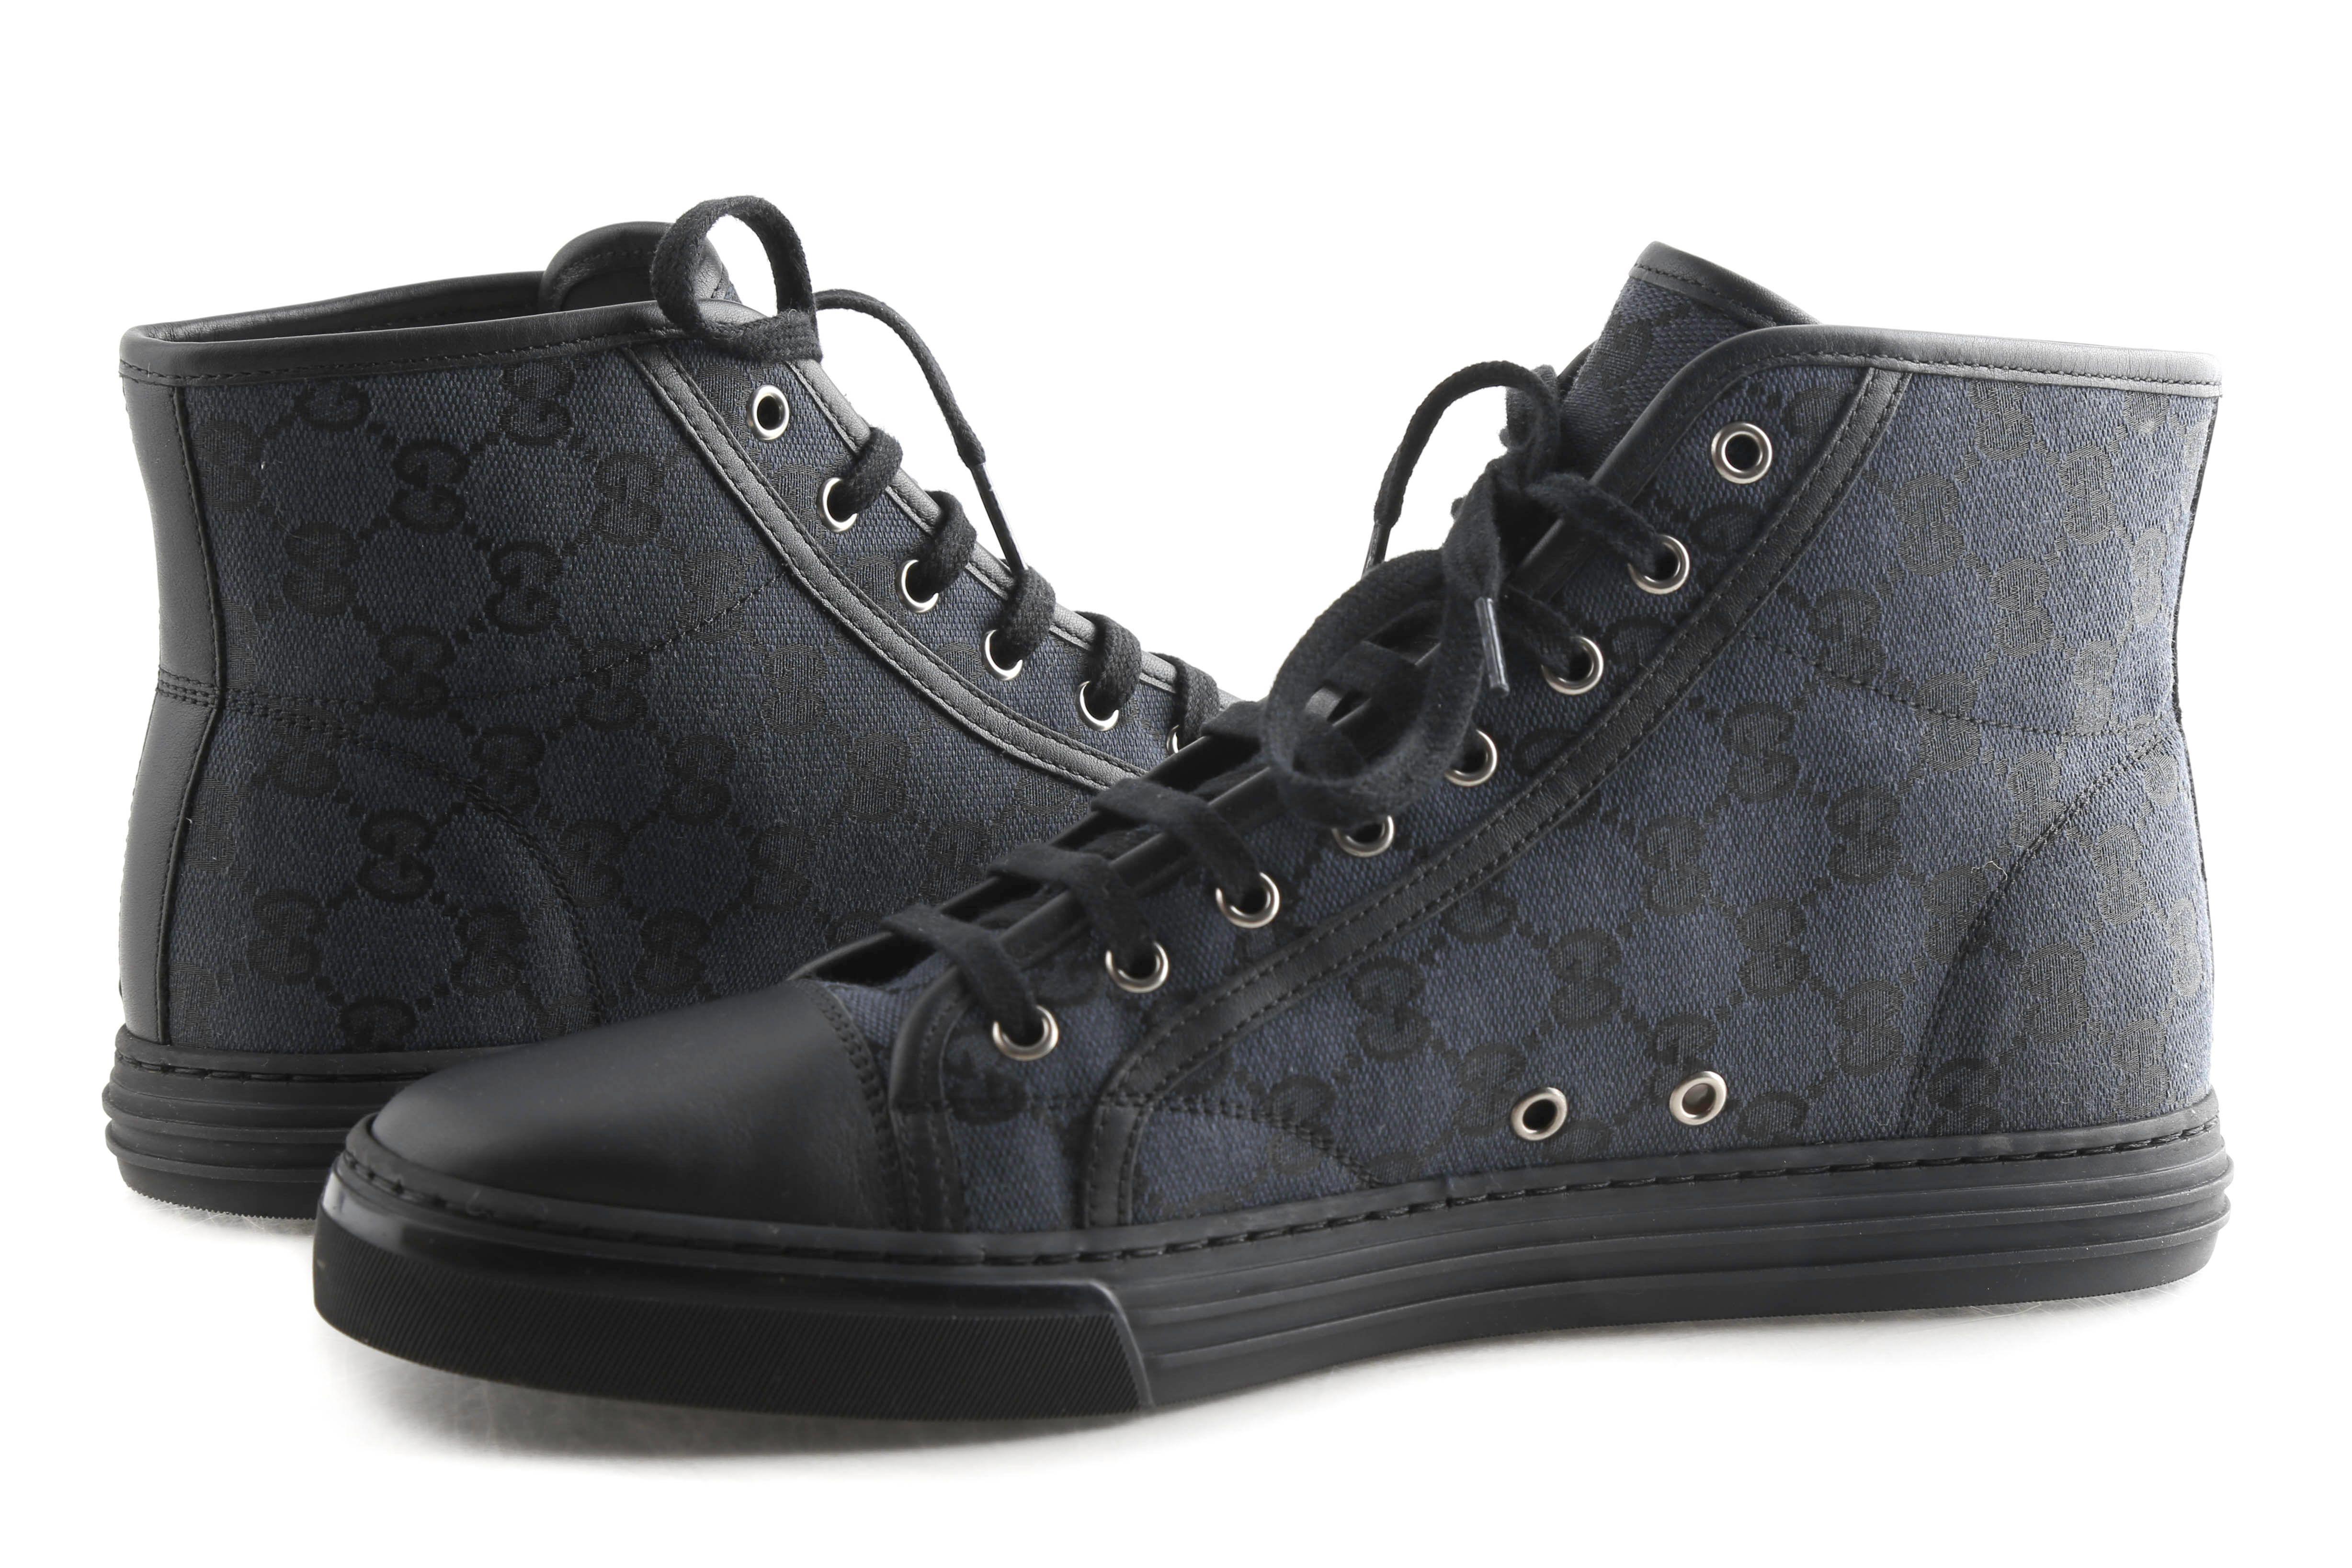 Gucci GG Canvas High Tops | LePrix